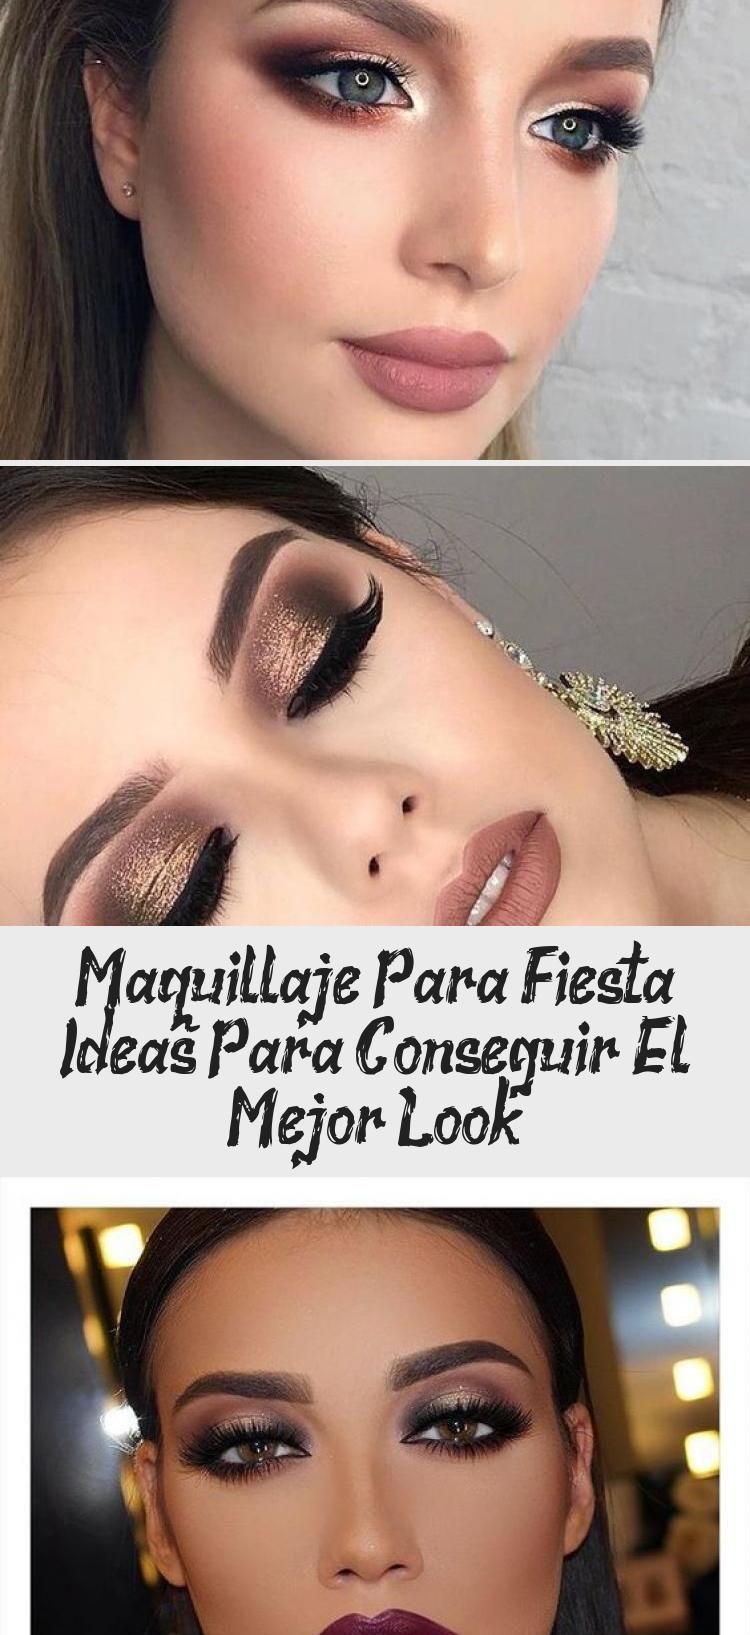 En Blog En Blog In 2020 Party Makeup Night Makeup Natural Makeup